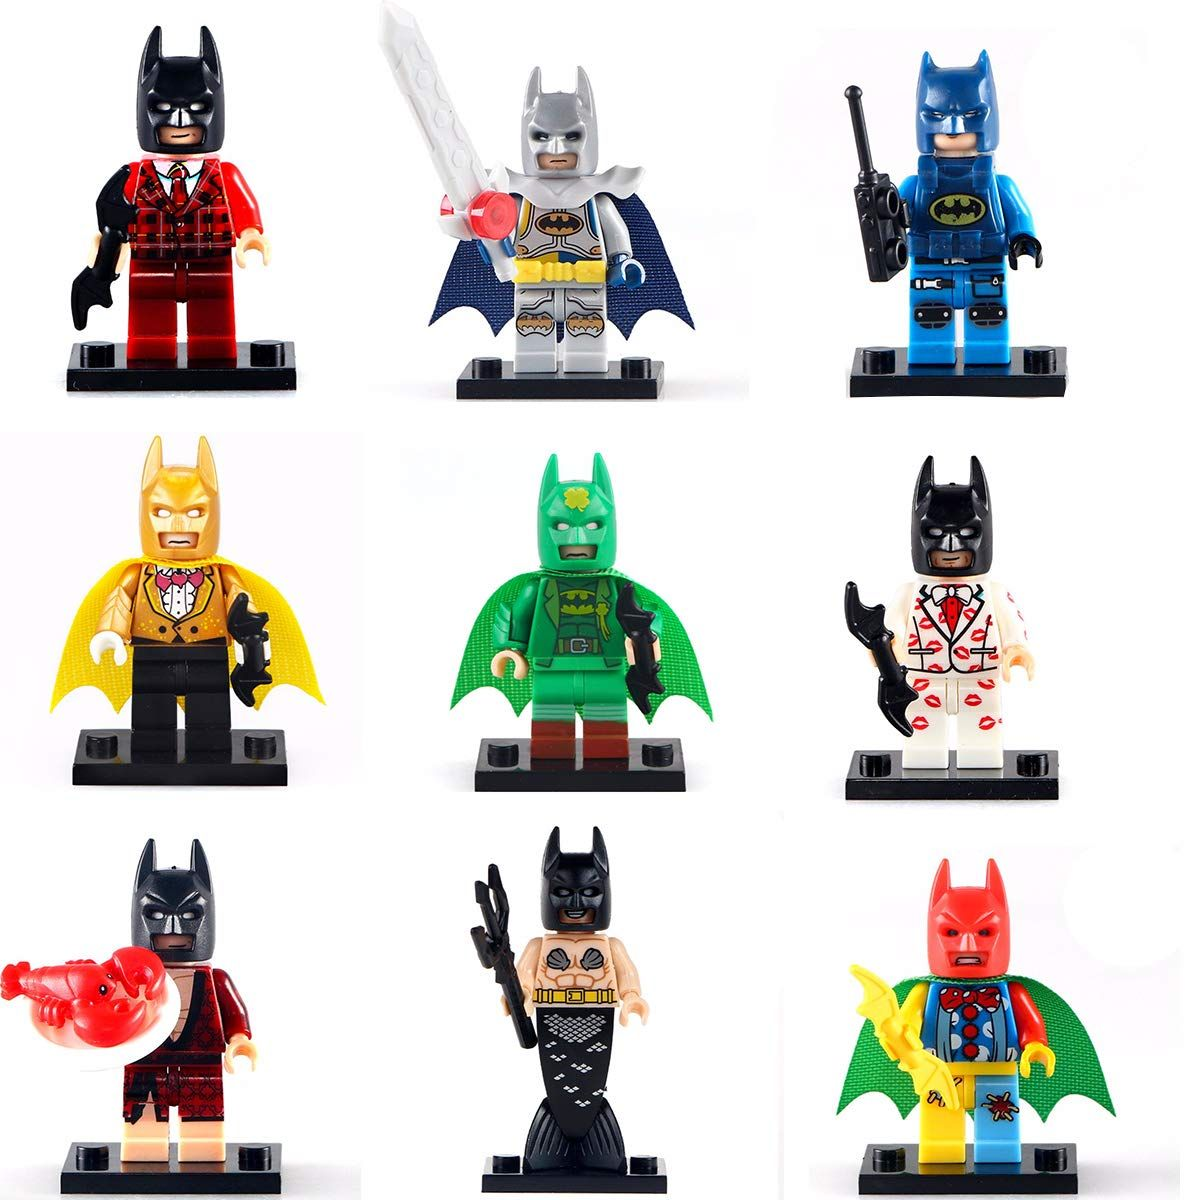 Kaizoot 9x Piece Minifigures Set Batman